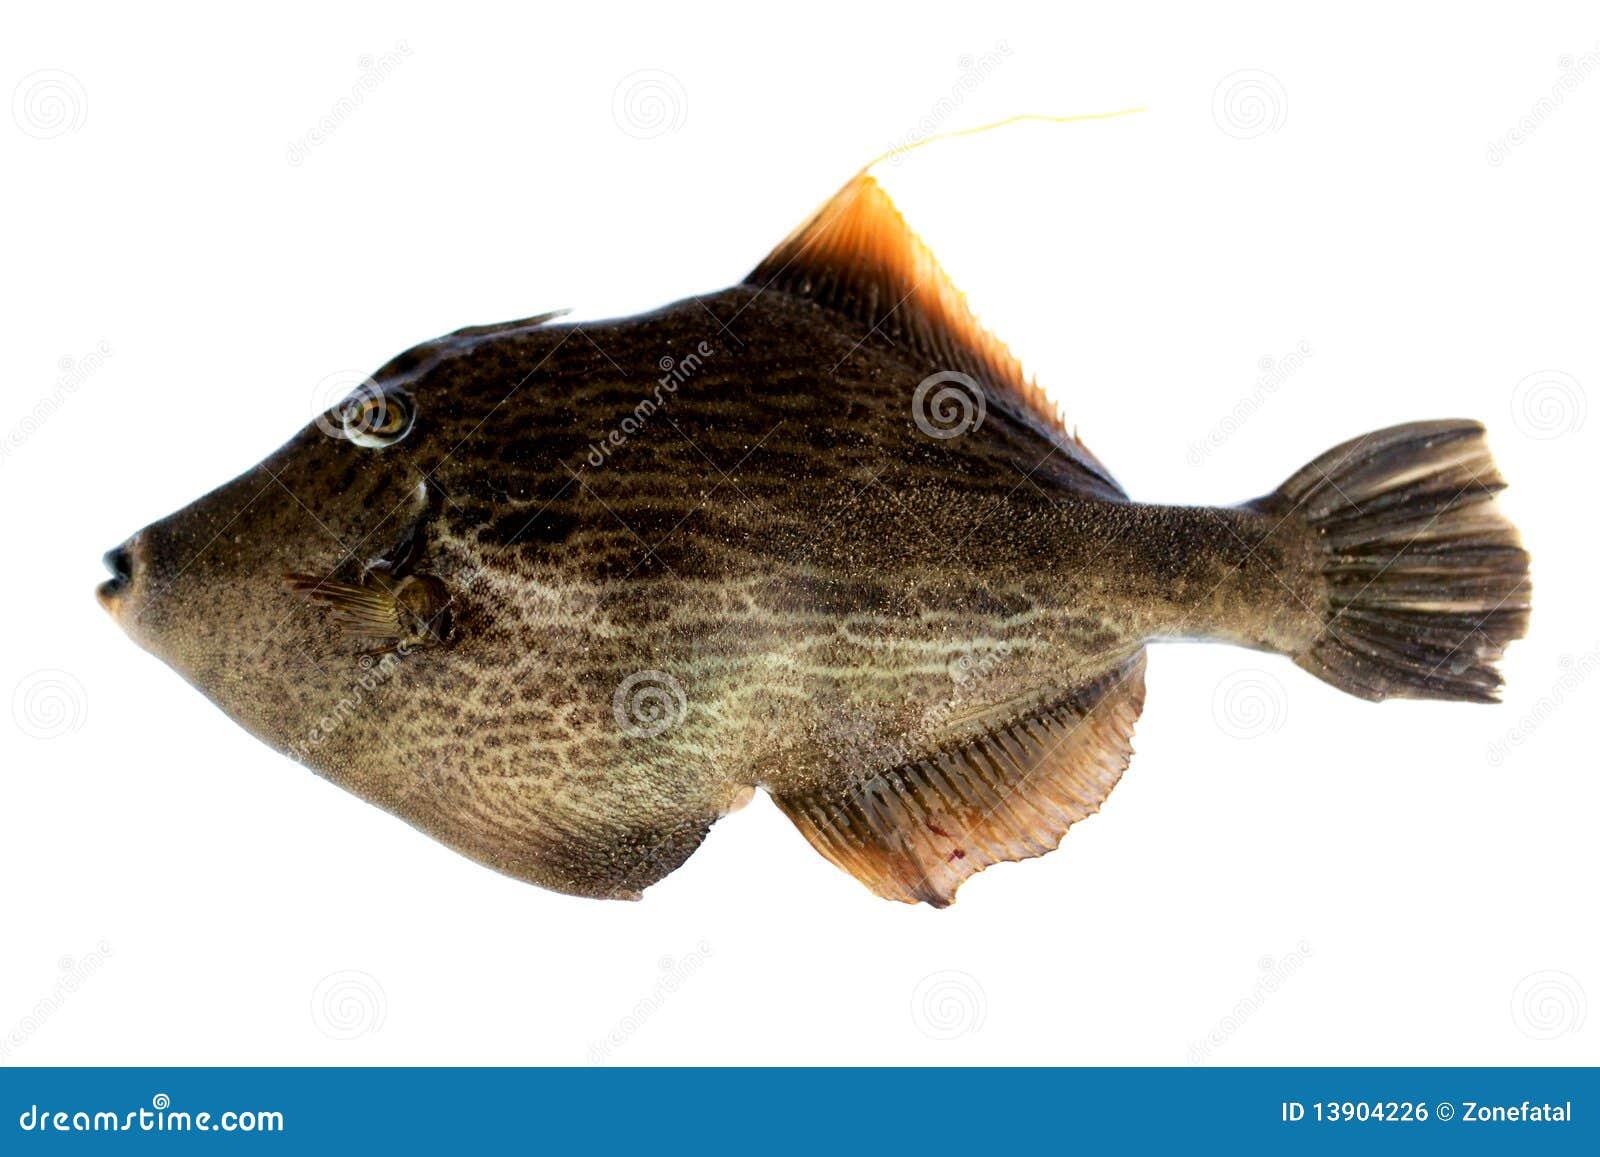 Pig Fish Royalty Free Stock Image - Image: 13904226